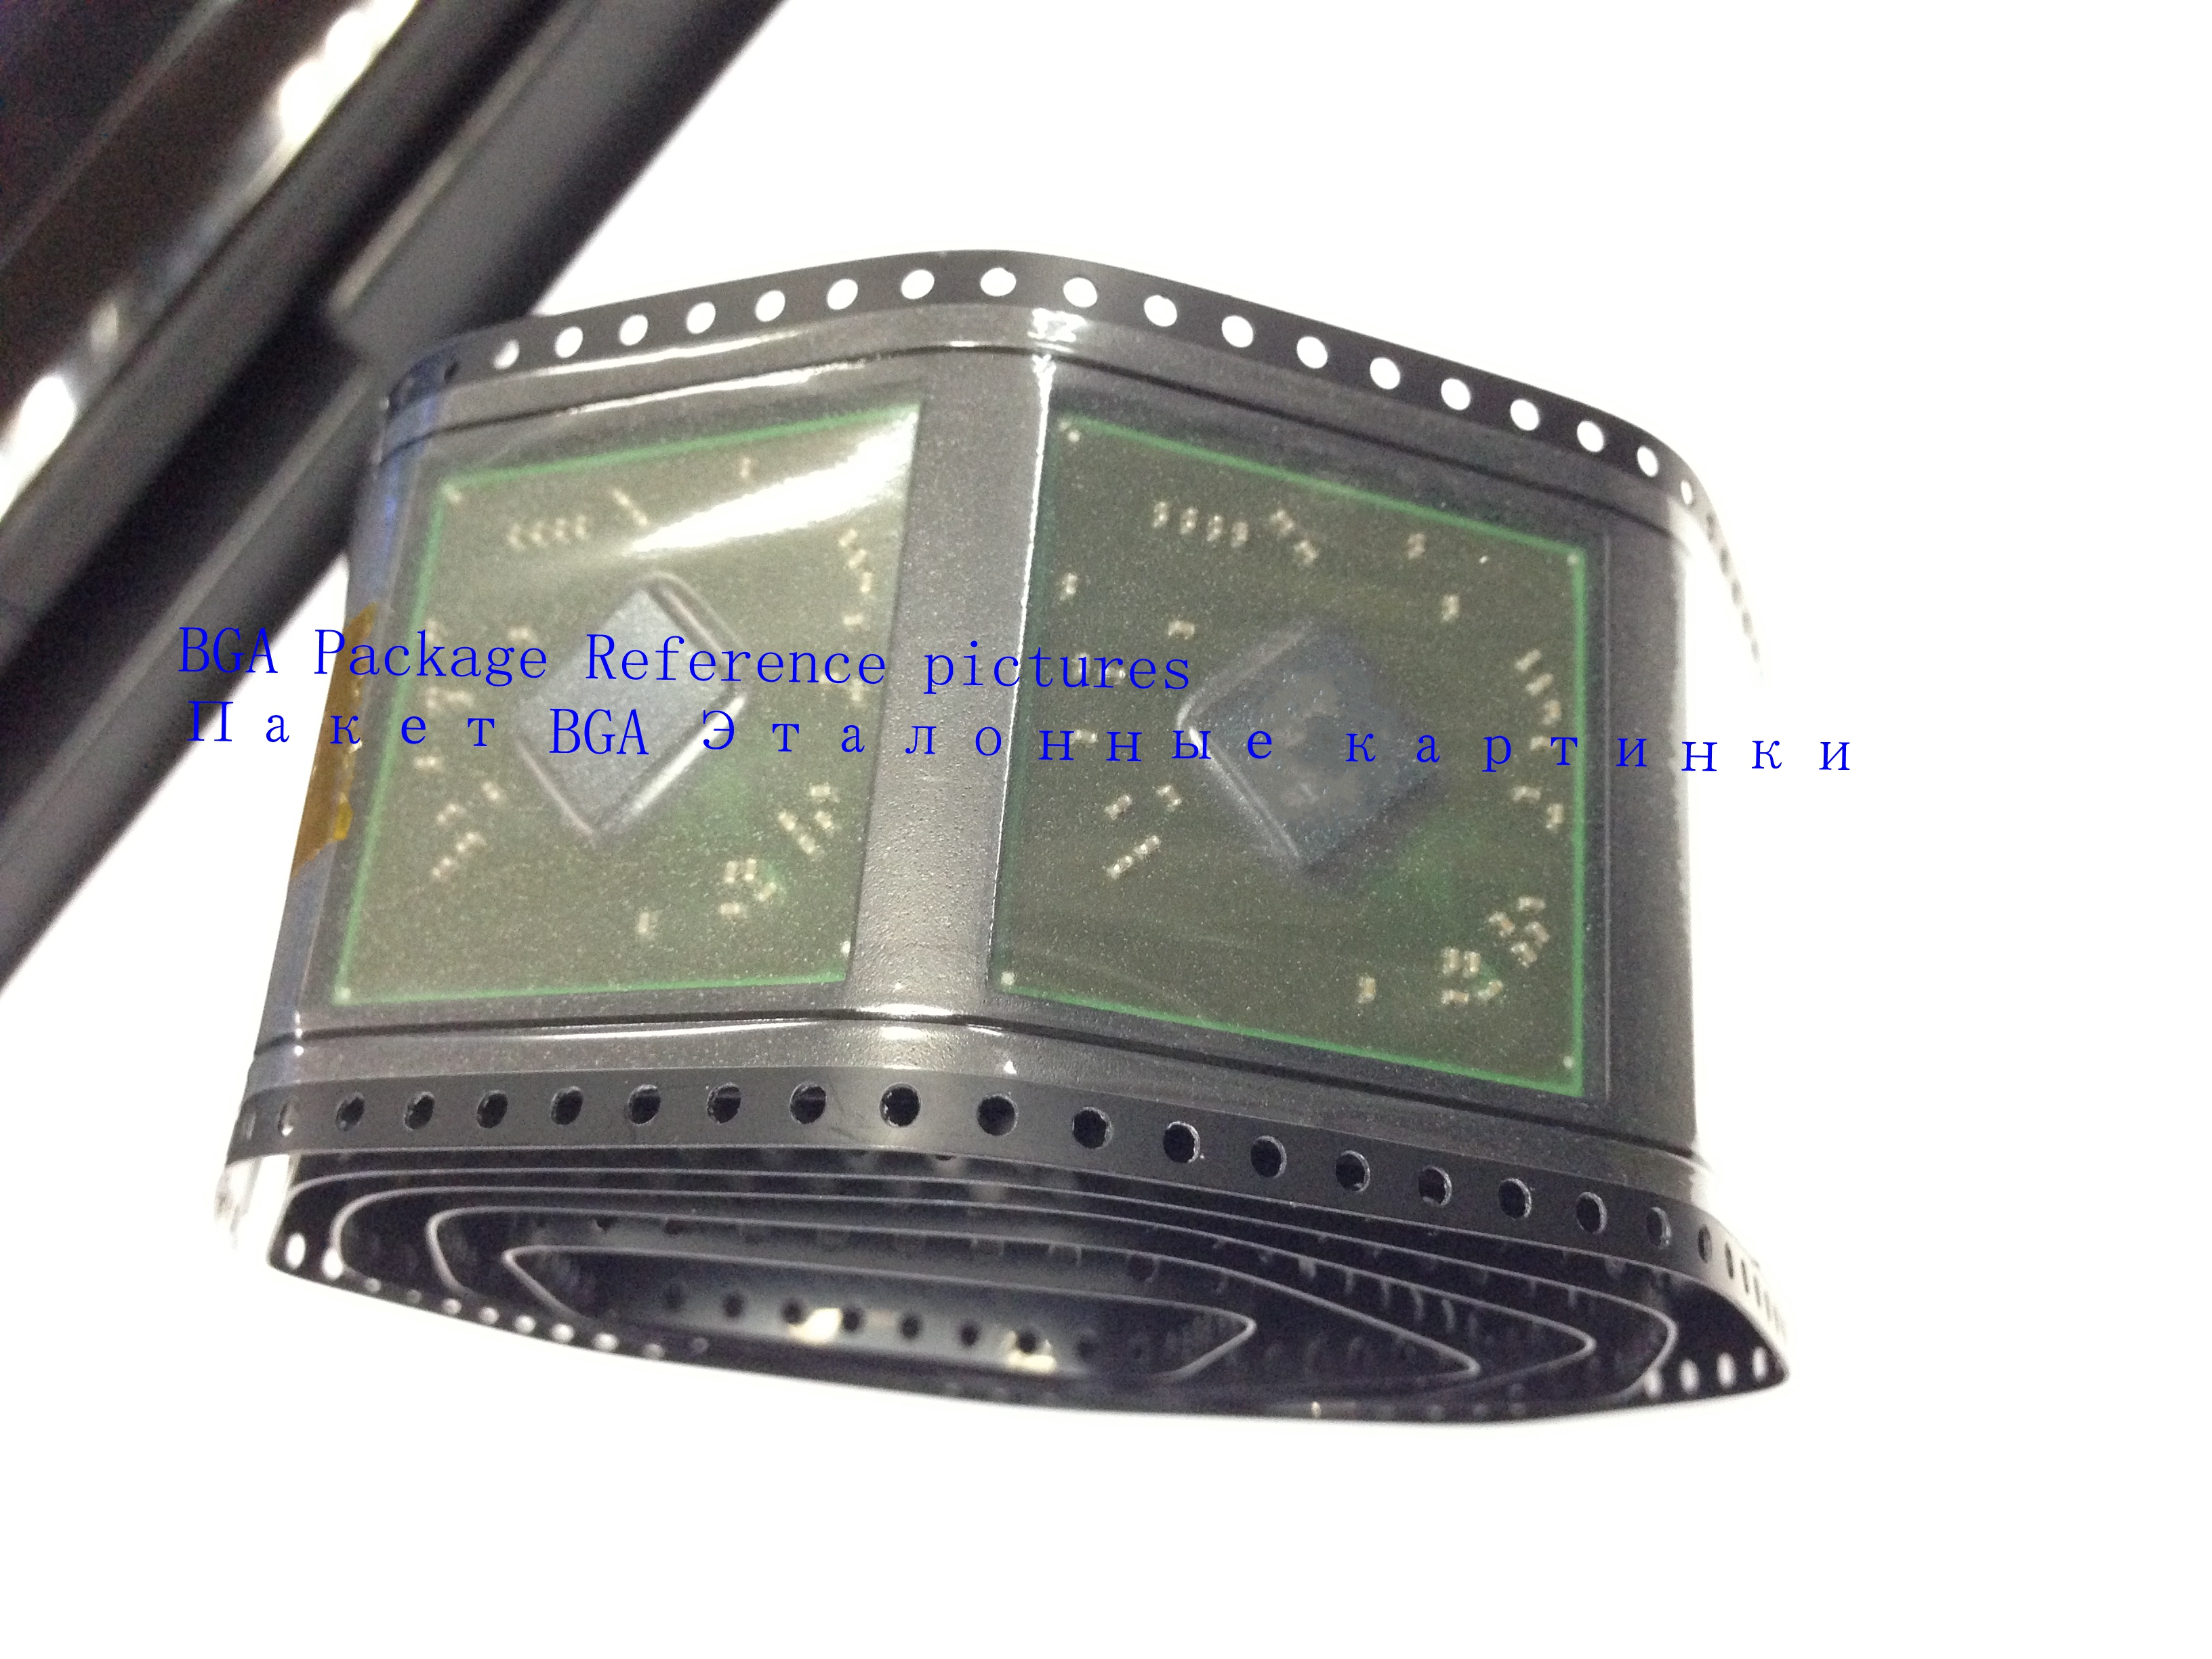 1pcs/lot 100% New AC82P43 SLB89 BGA Chipset1pcs/lot 100% New AC82P43 SLB89 BGA Chipset